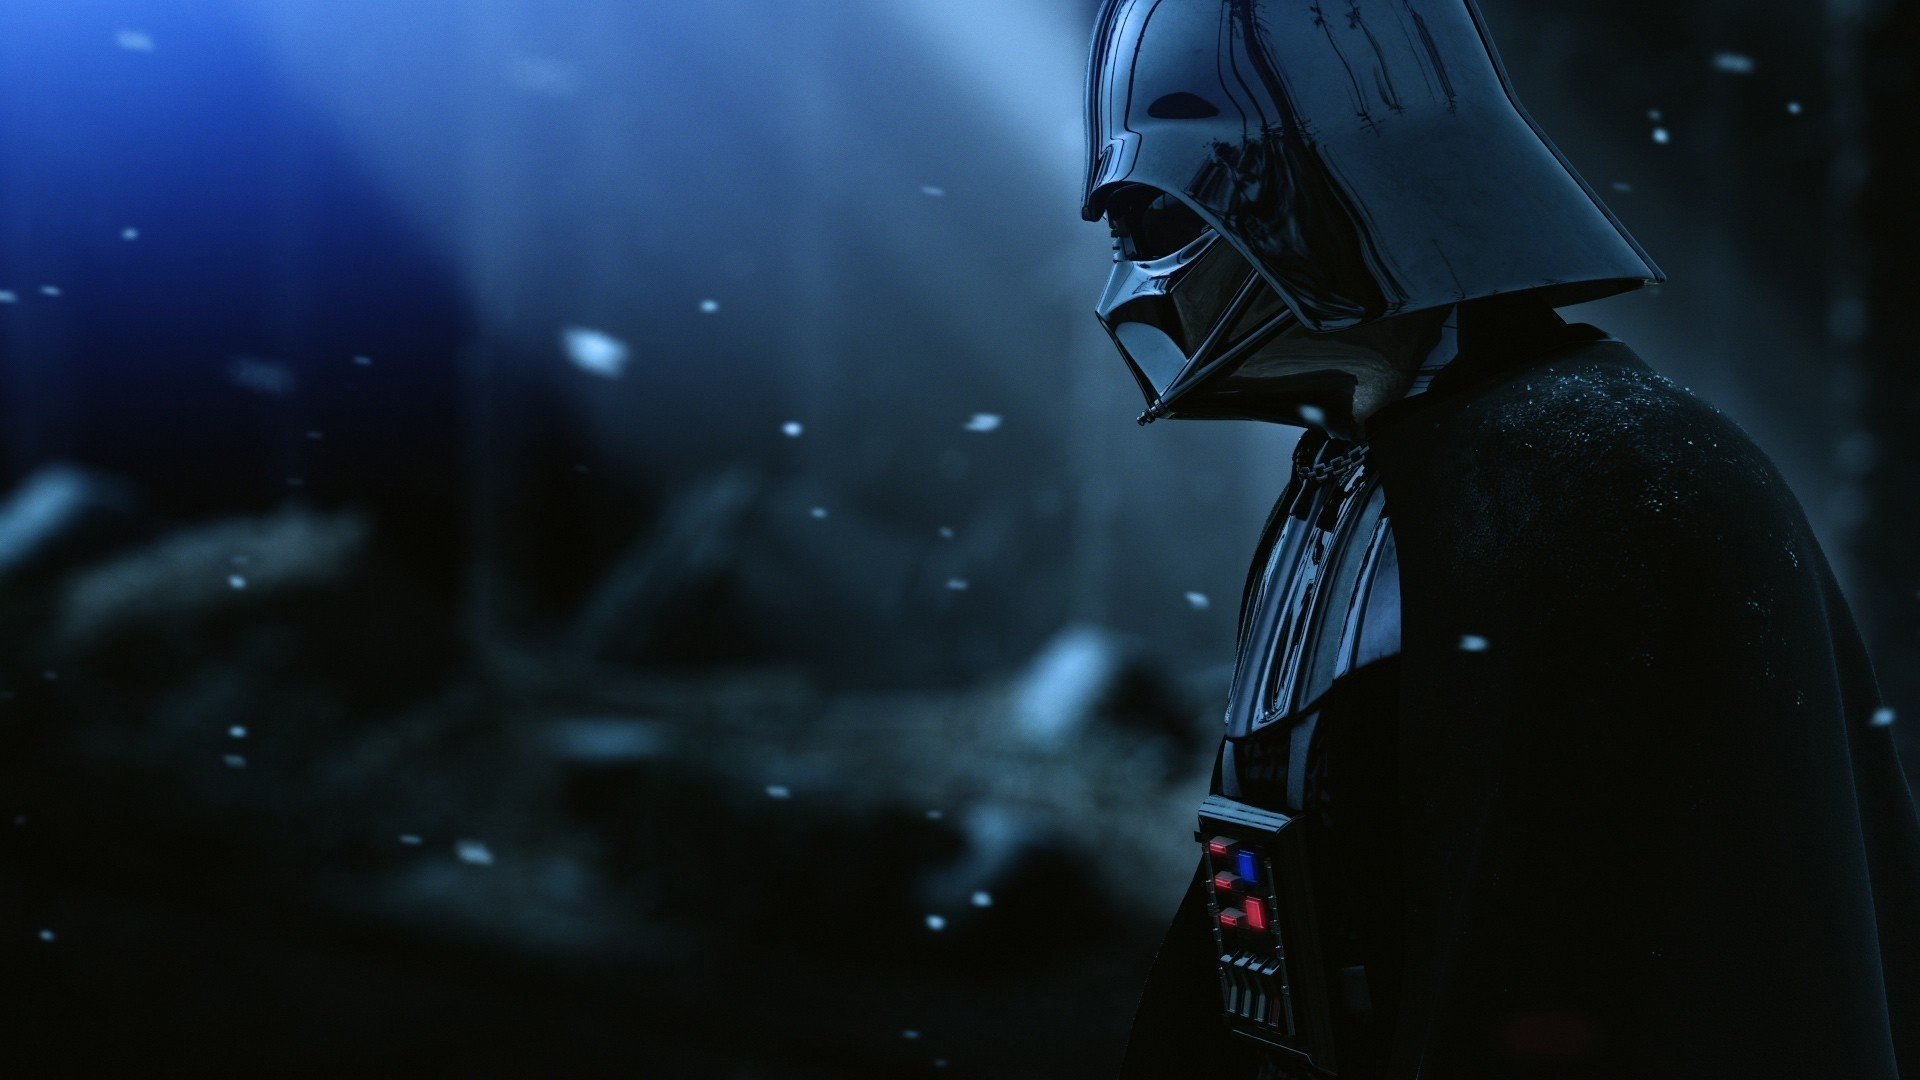 sith, star wars, darth maul · darth vader, armor, star wars